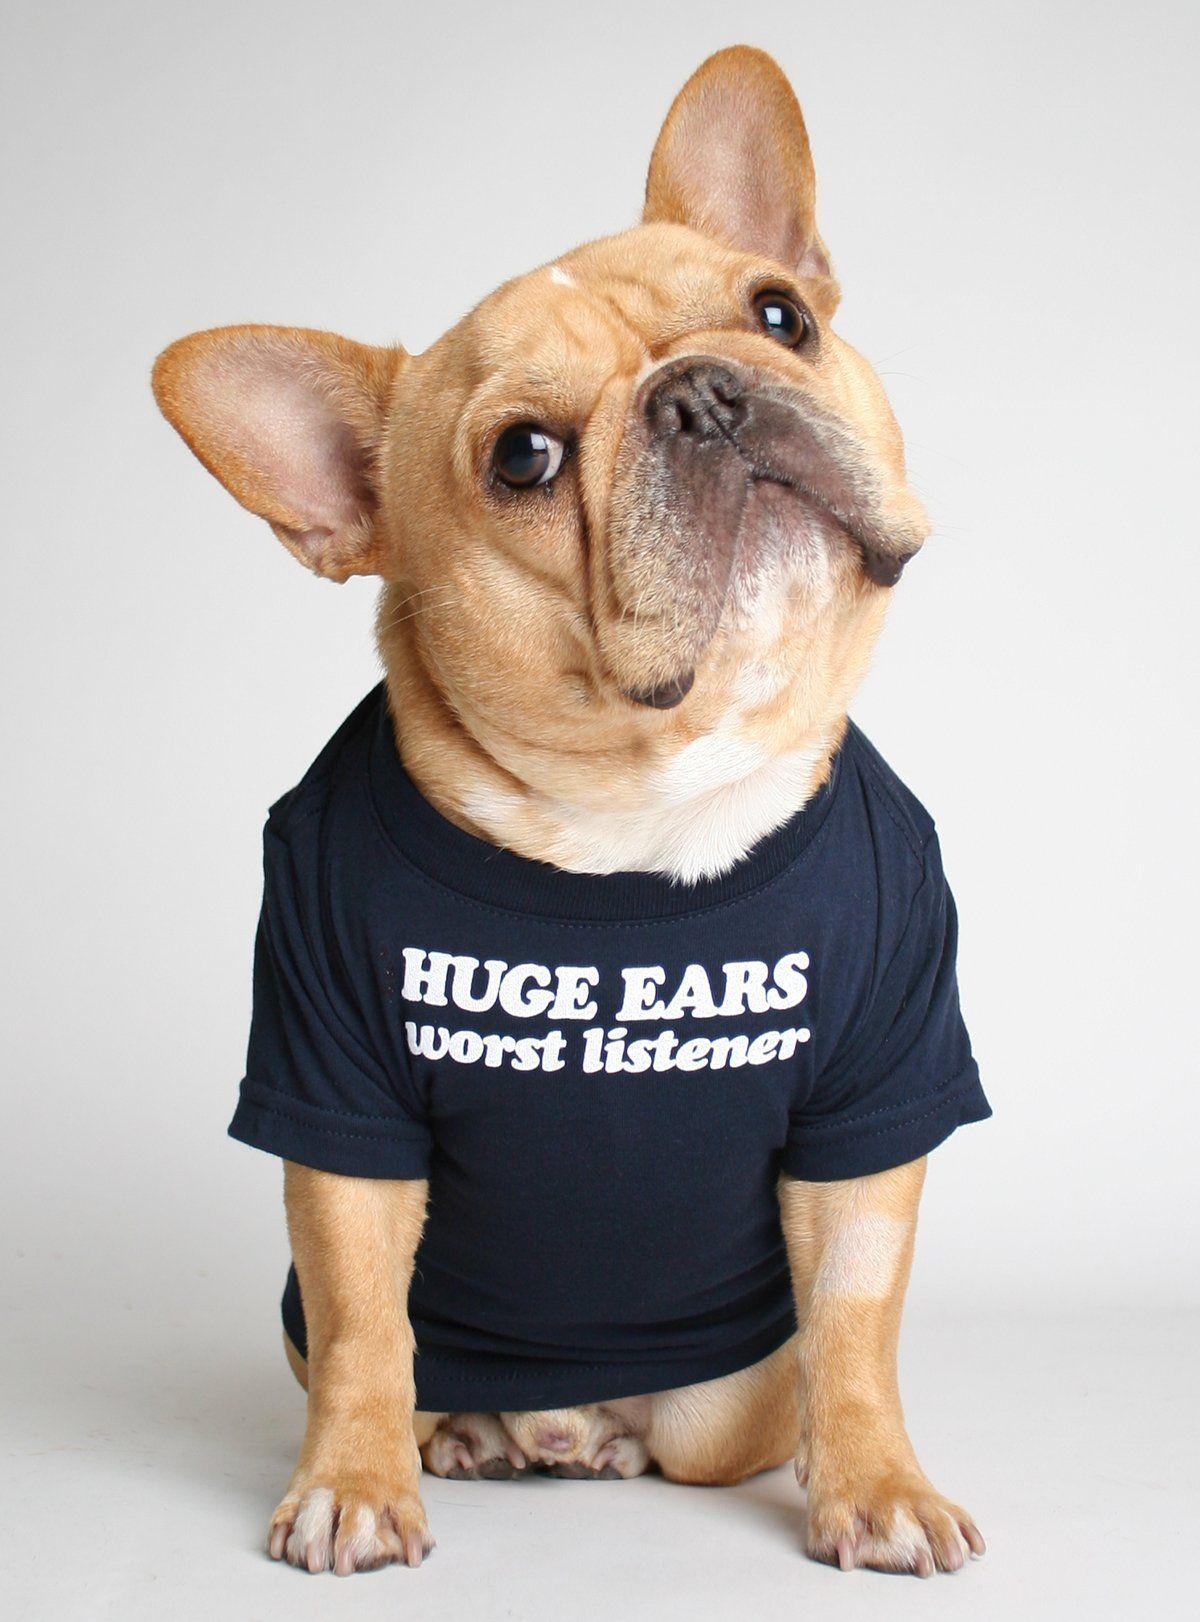 Huge Ears Worst Listener Dog Tee Dogs Tee French Bulldog Puppies Bulldog Puppies